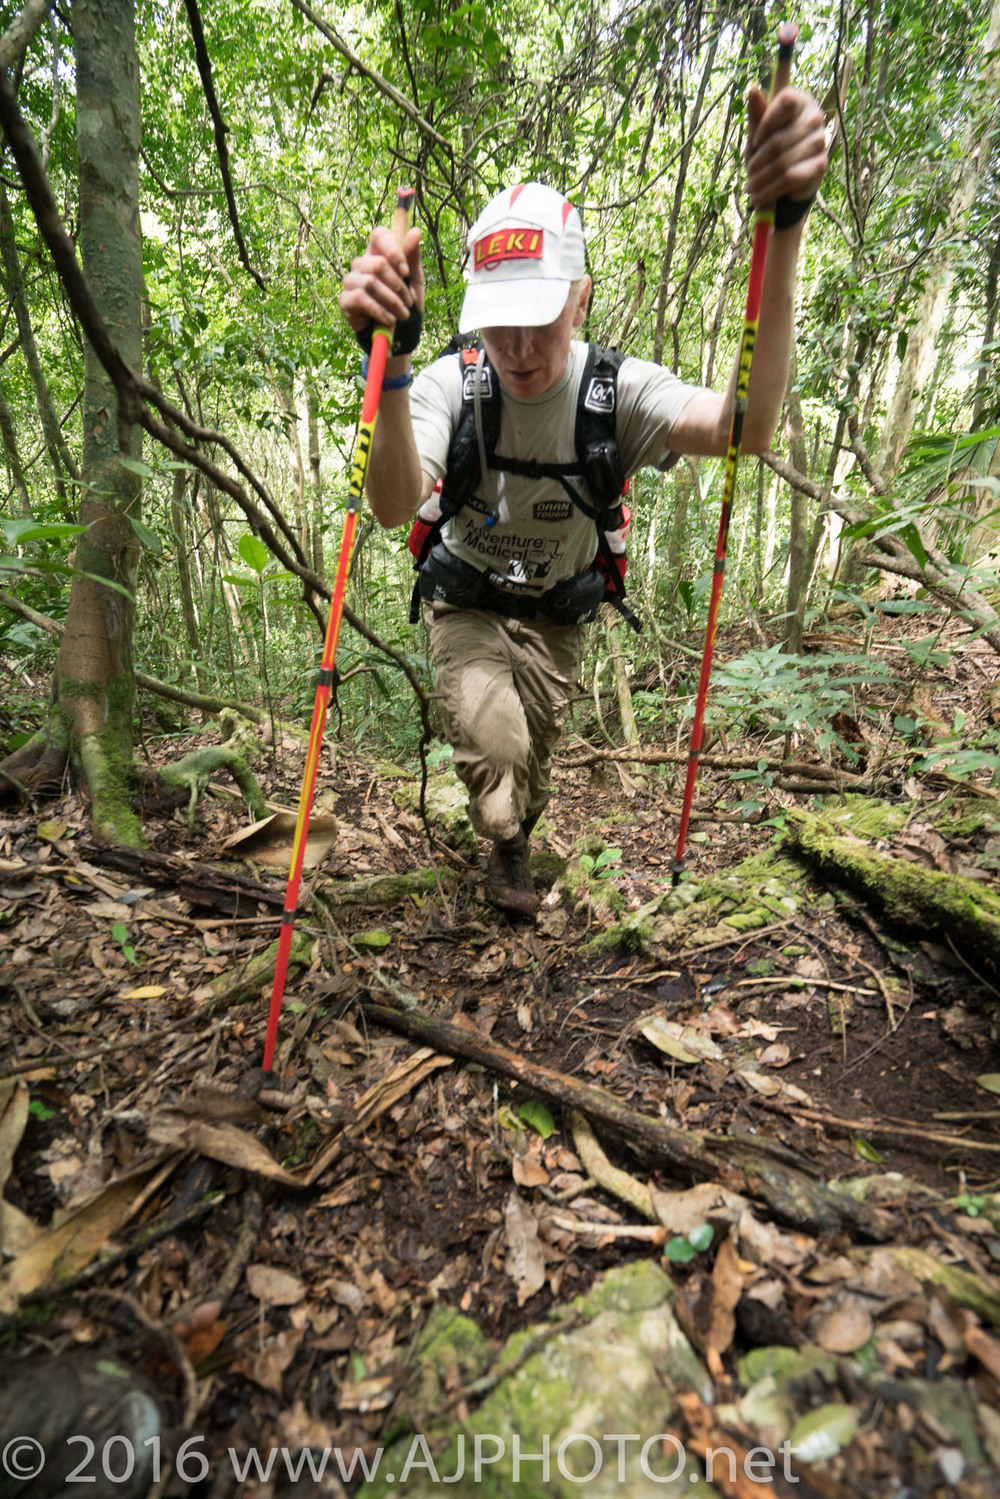 Mari loving her Leki trekking poles